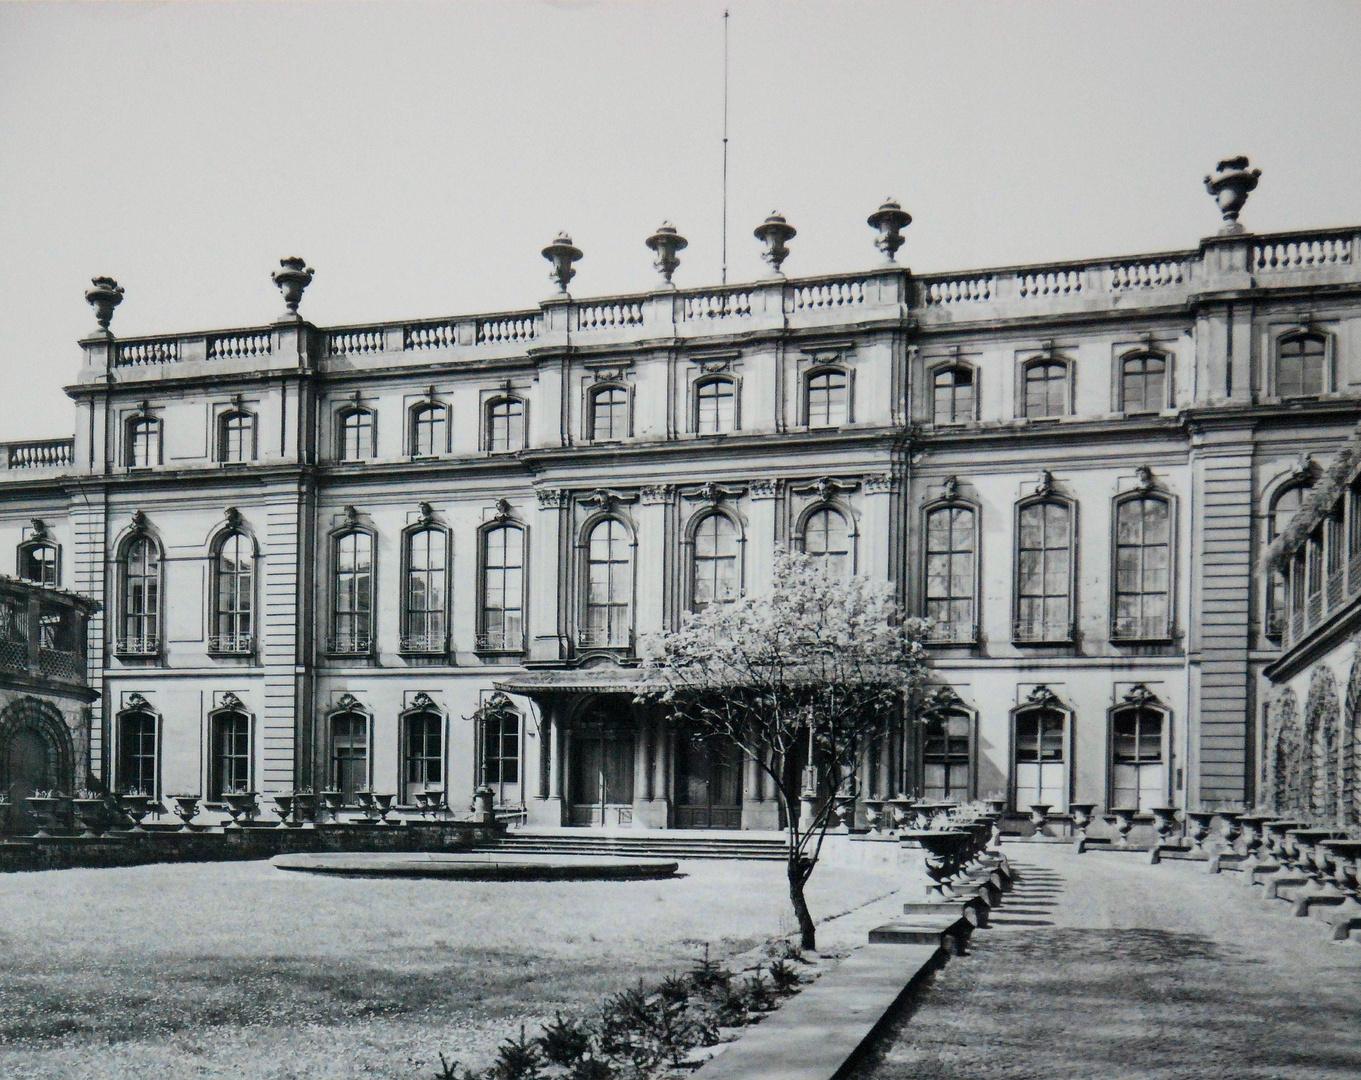 Berlin Prinz-Albrecht-Palais (1739), Wilhelmstraße